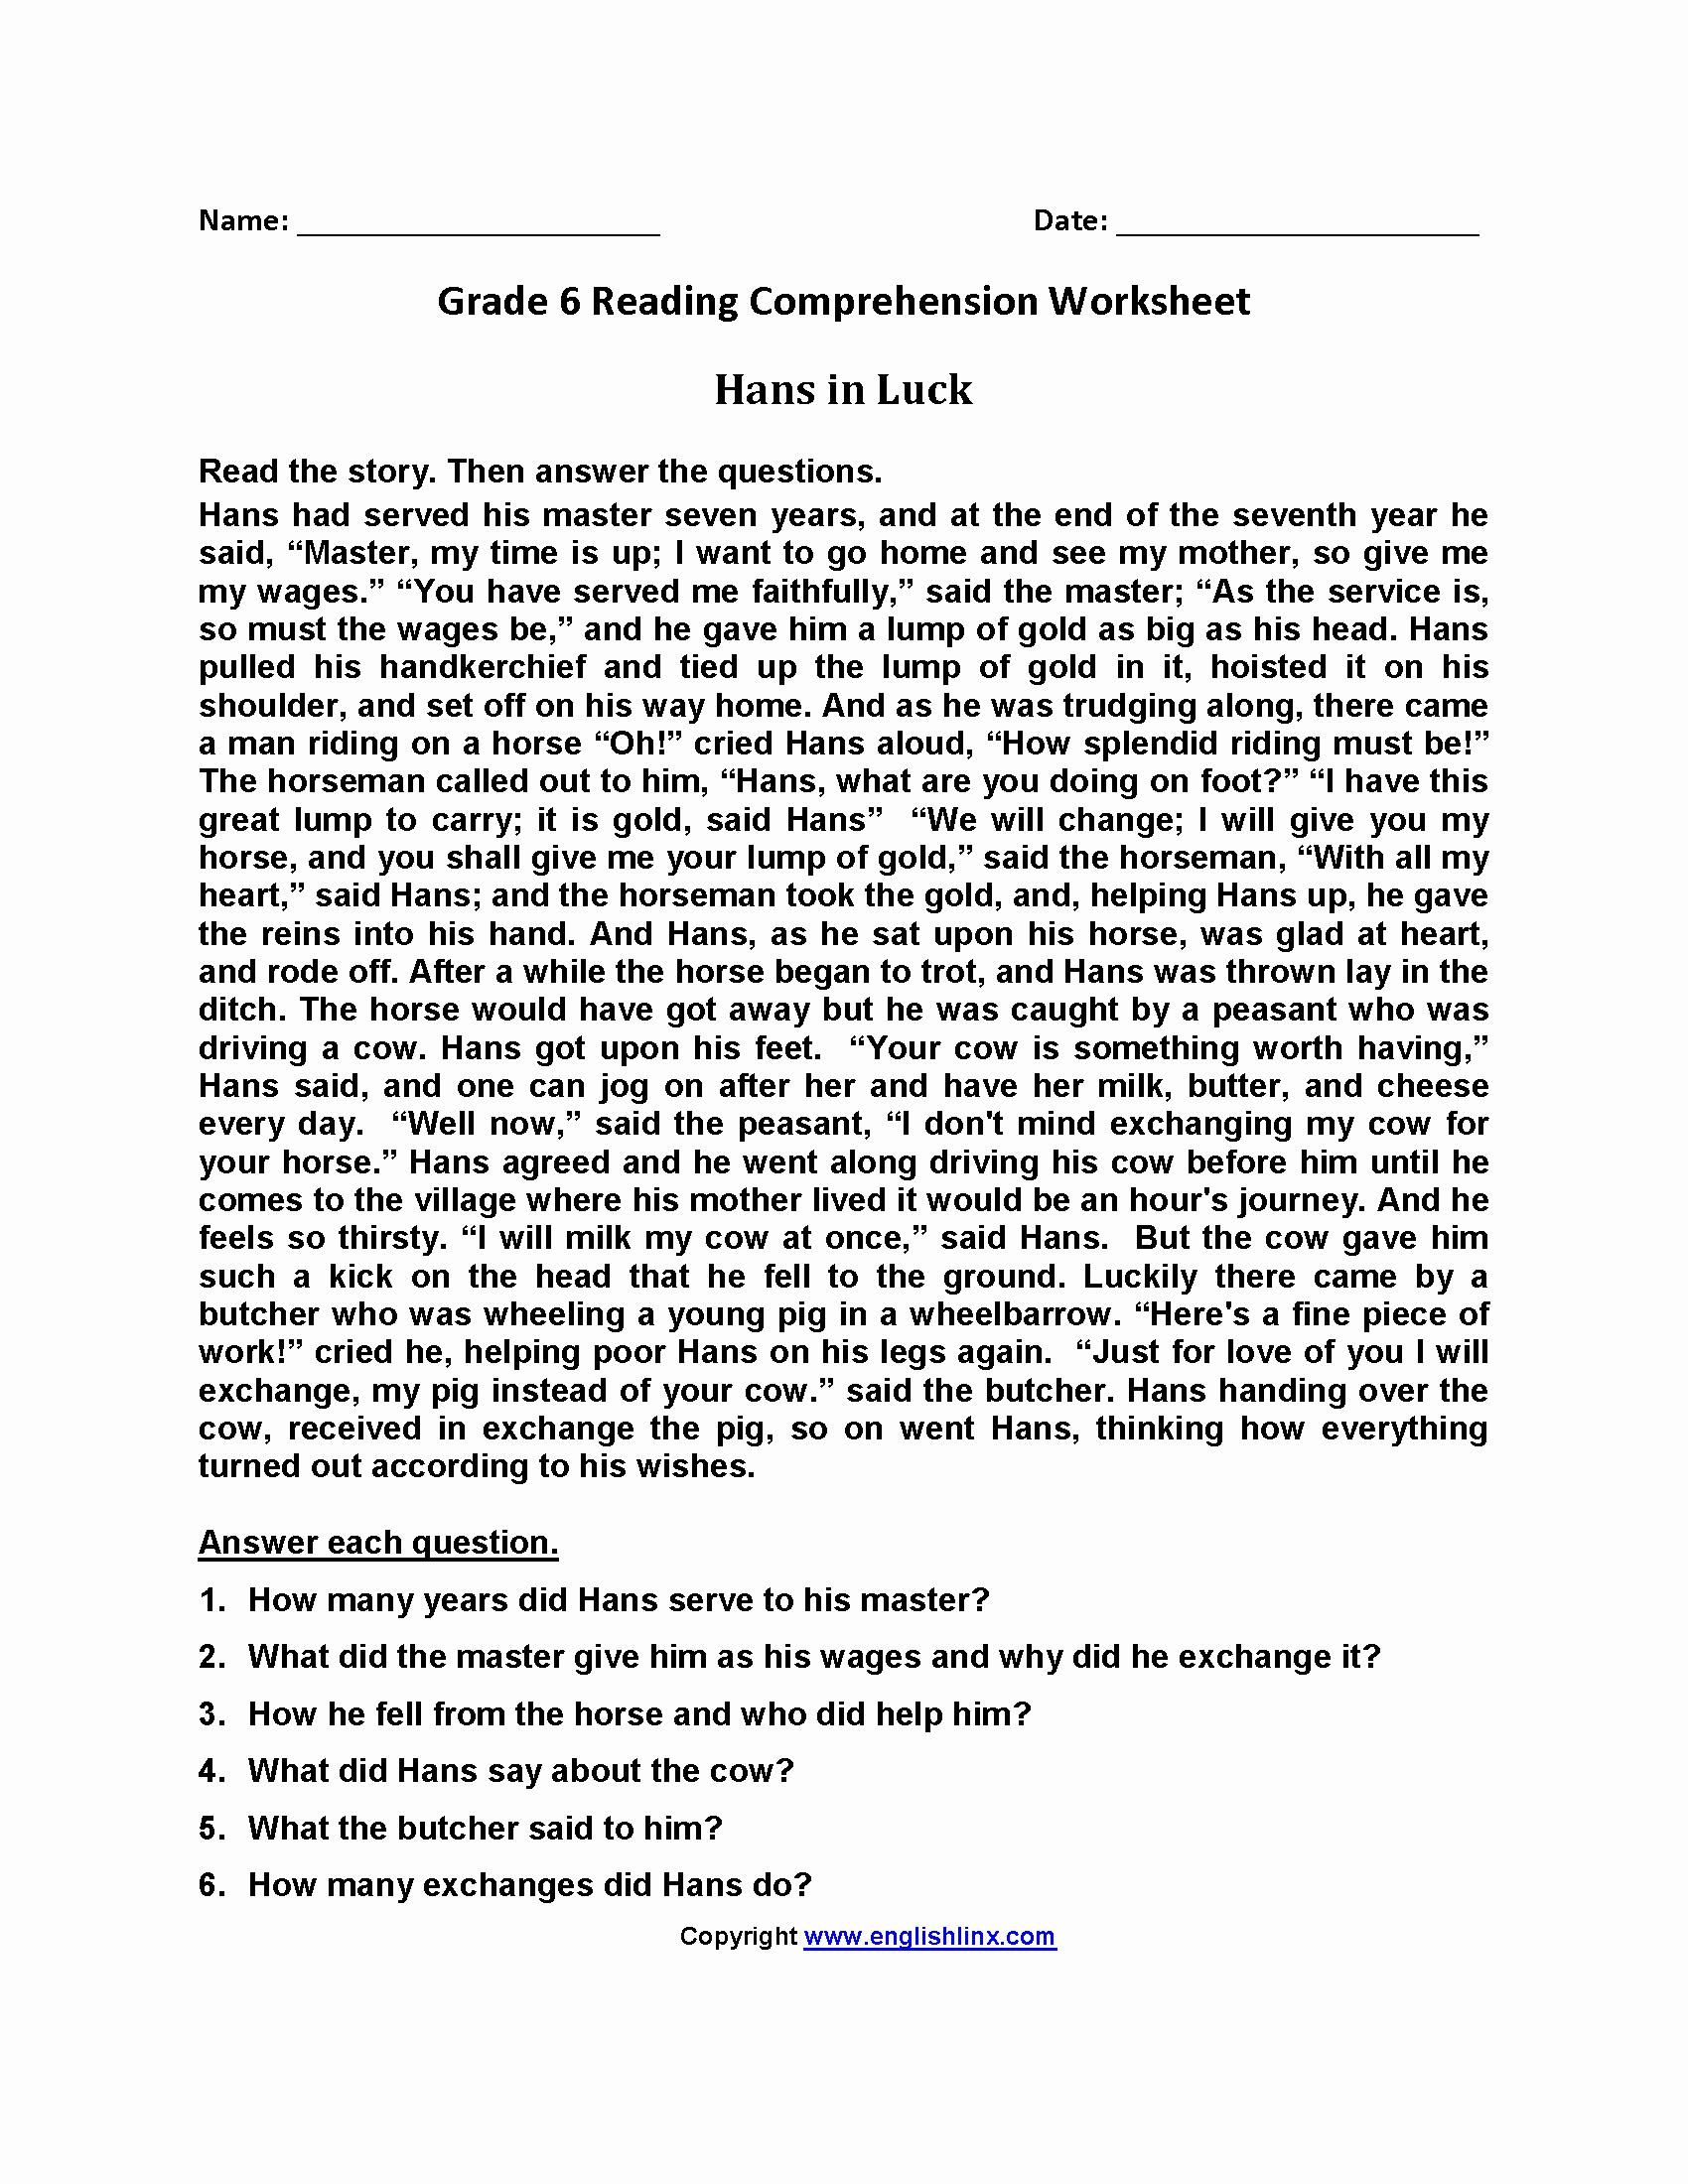 20 Free Printable Reading Comprehension Worksheets For 6Th Grade - Free Printable Reading Comprehension Worksheets Grade 5